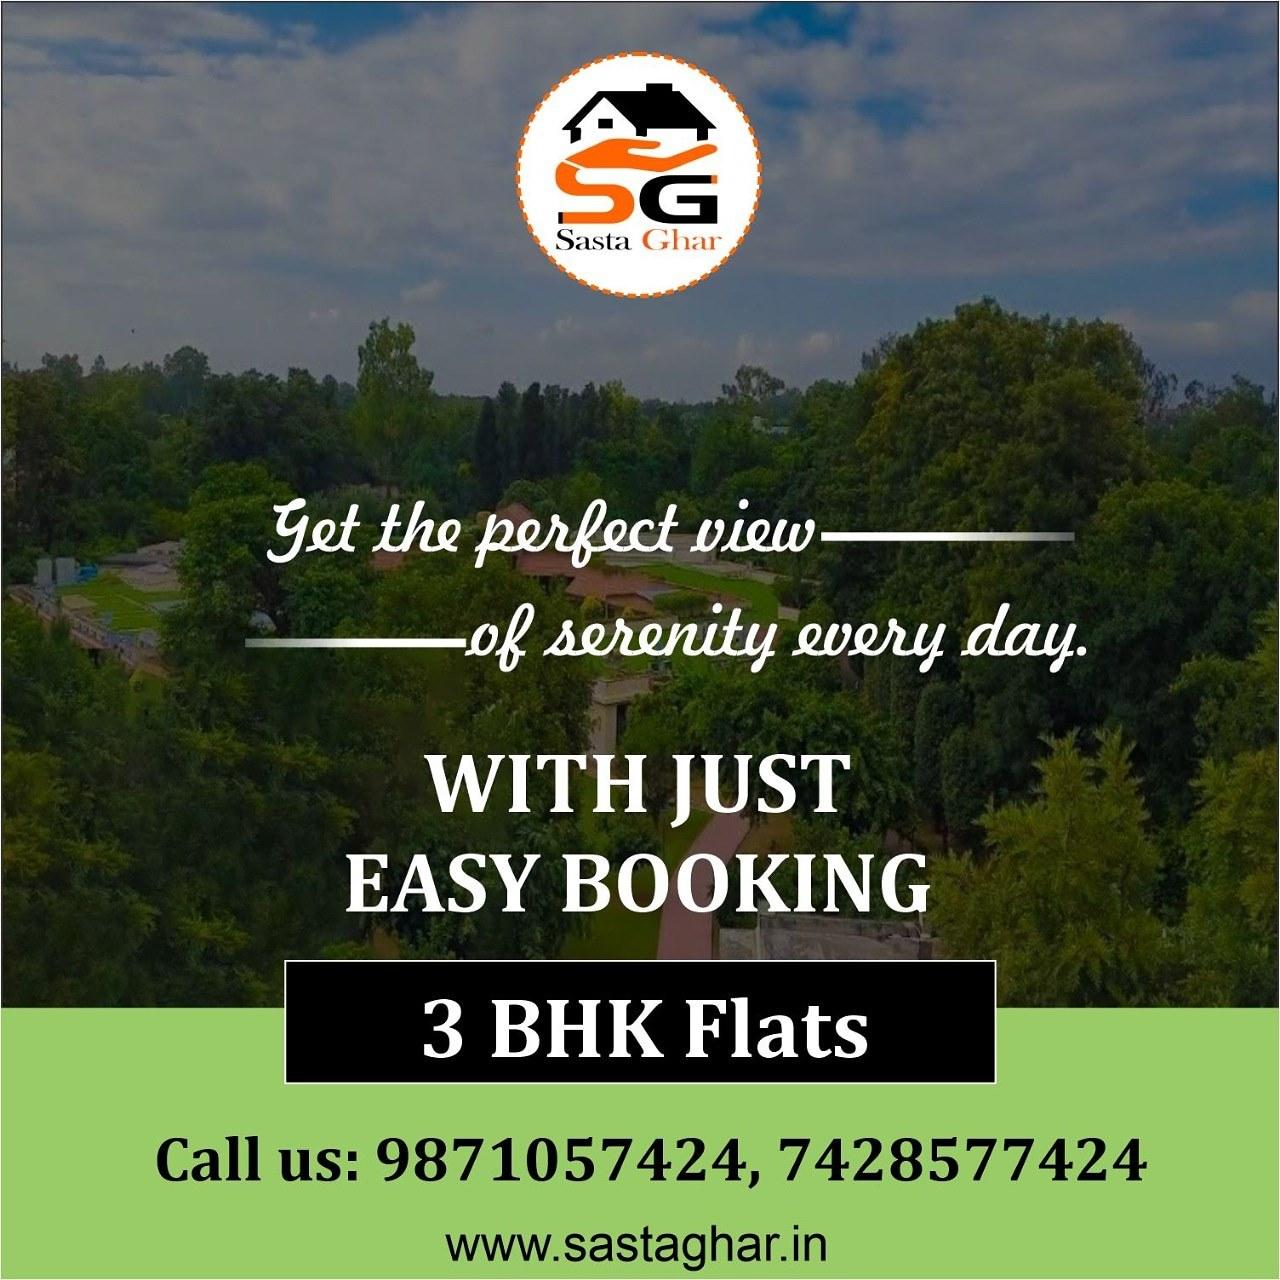 3 BHK Flat in Chattarpur Image